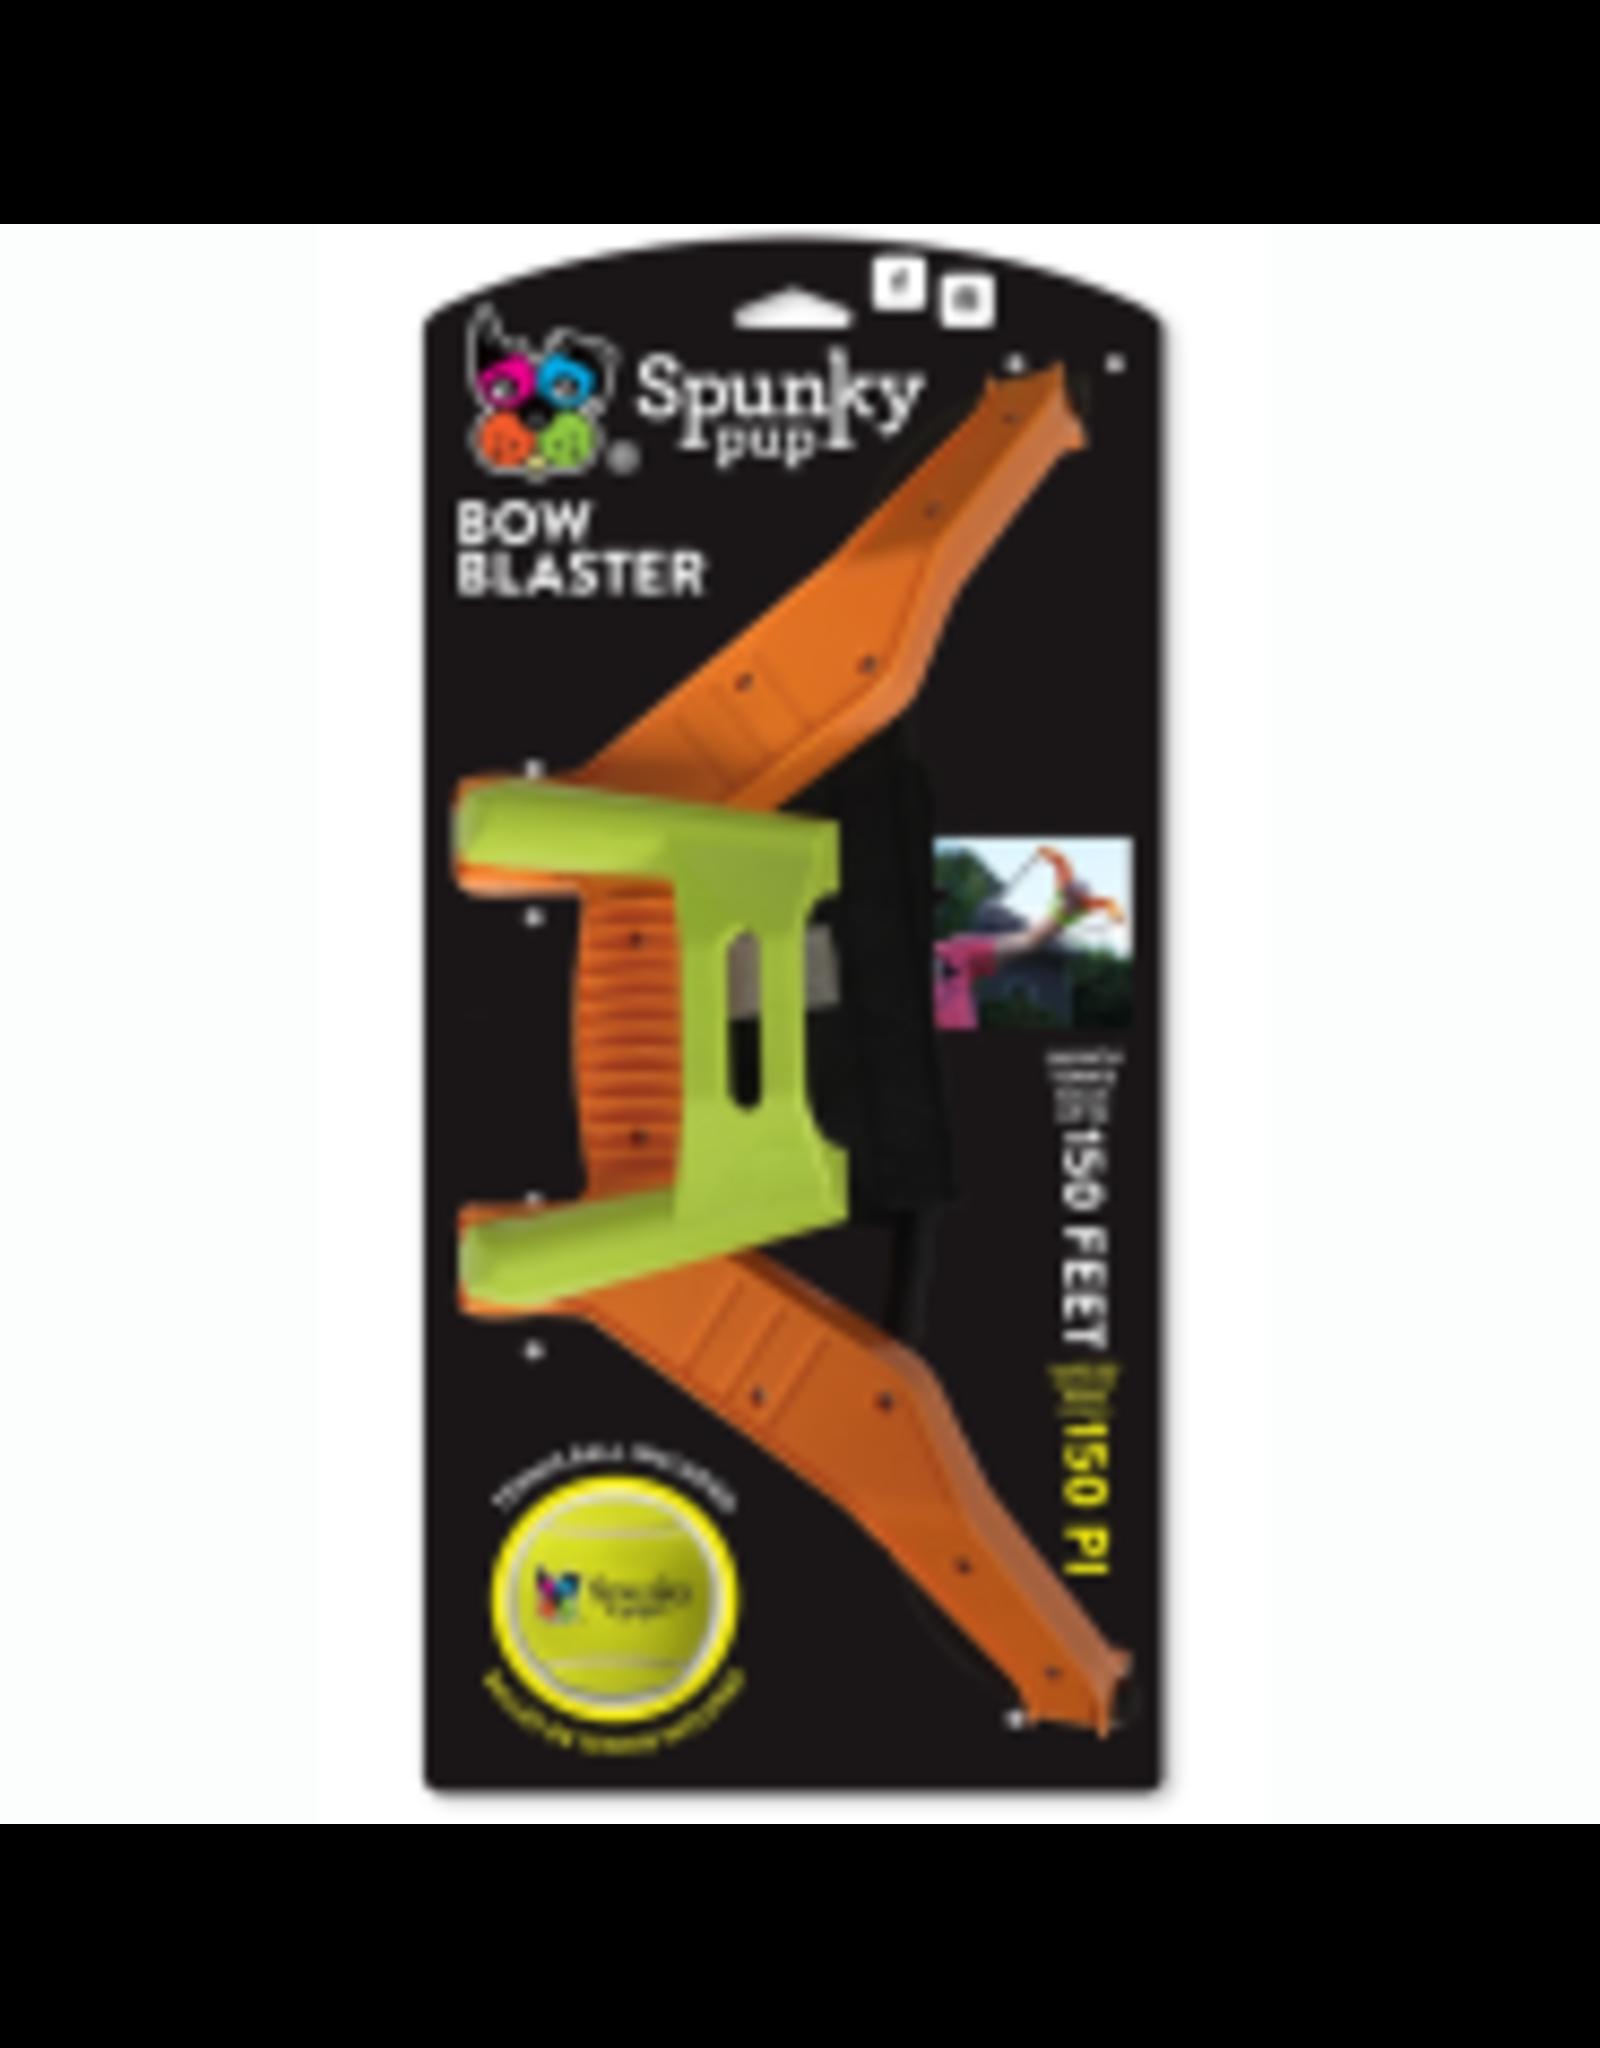 Spunky Pup Spunky Pup - Bow Blaster